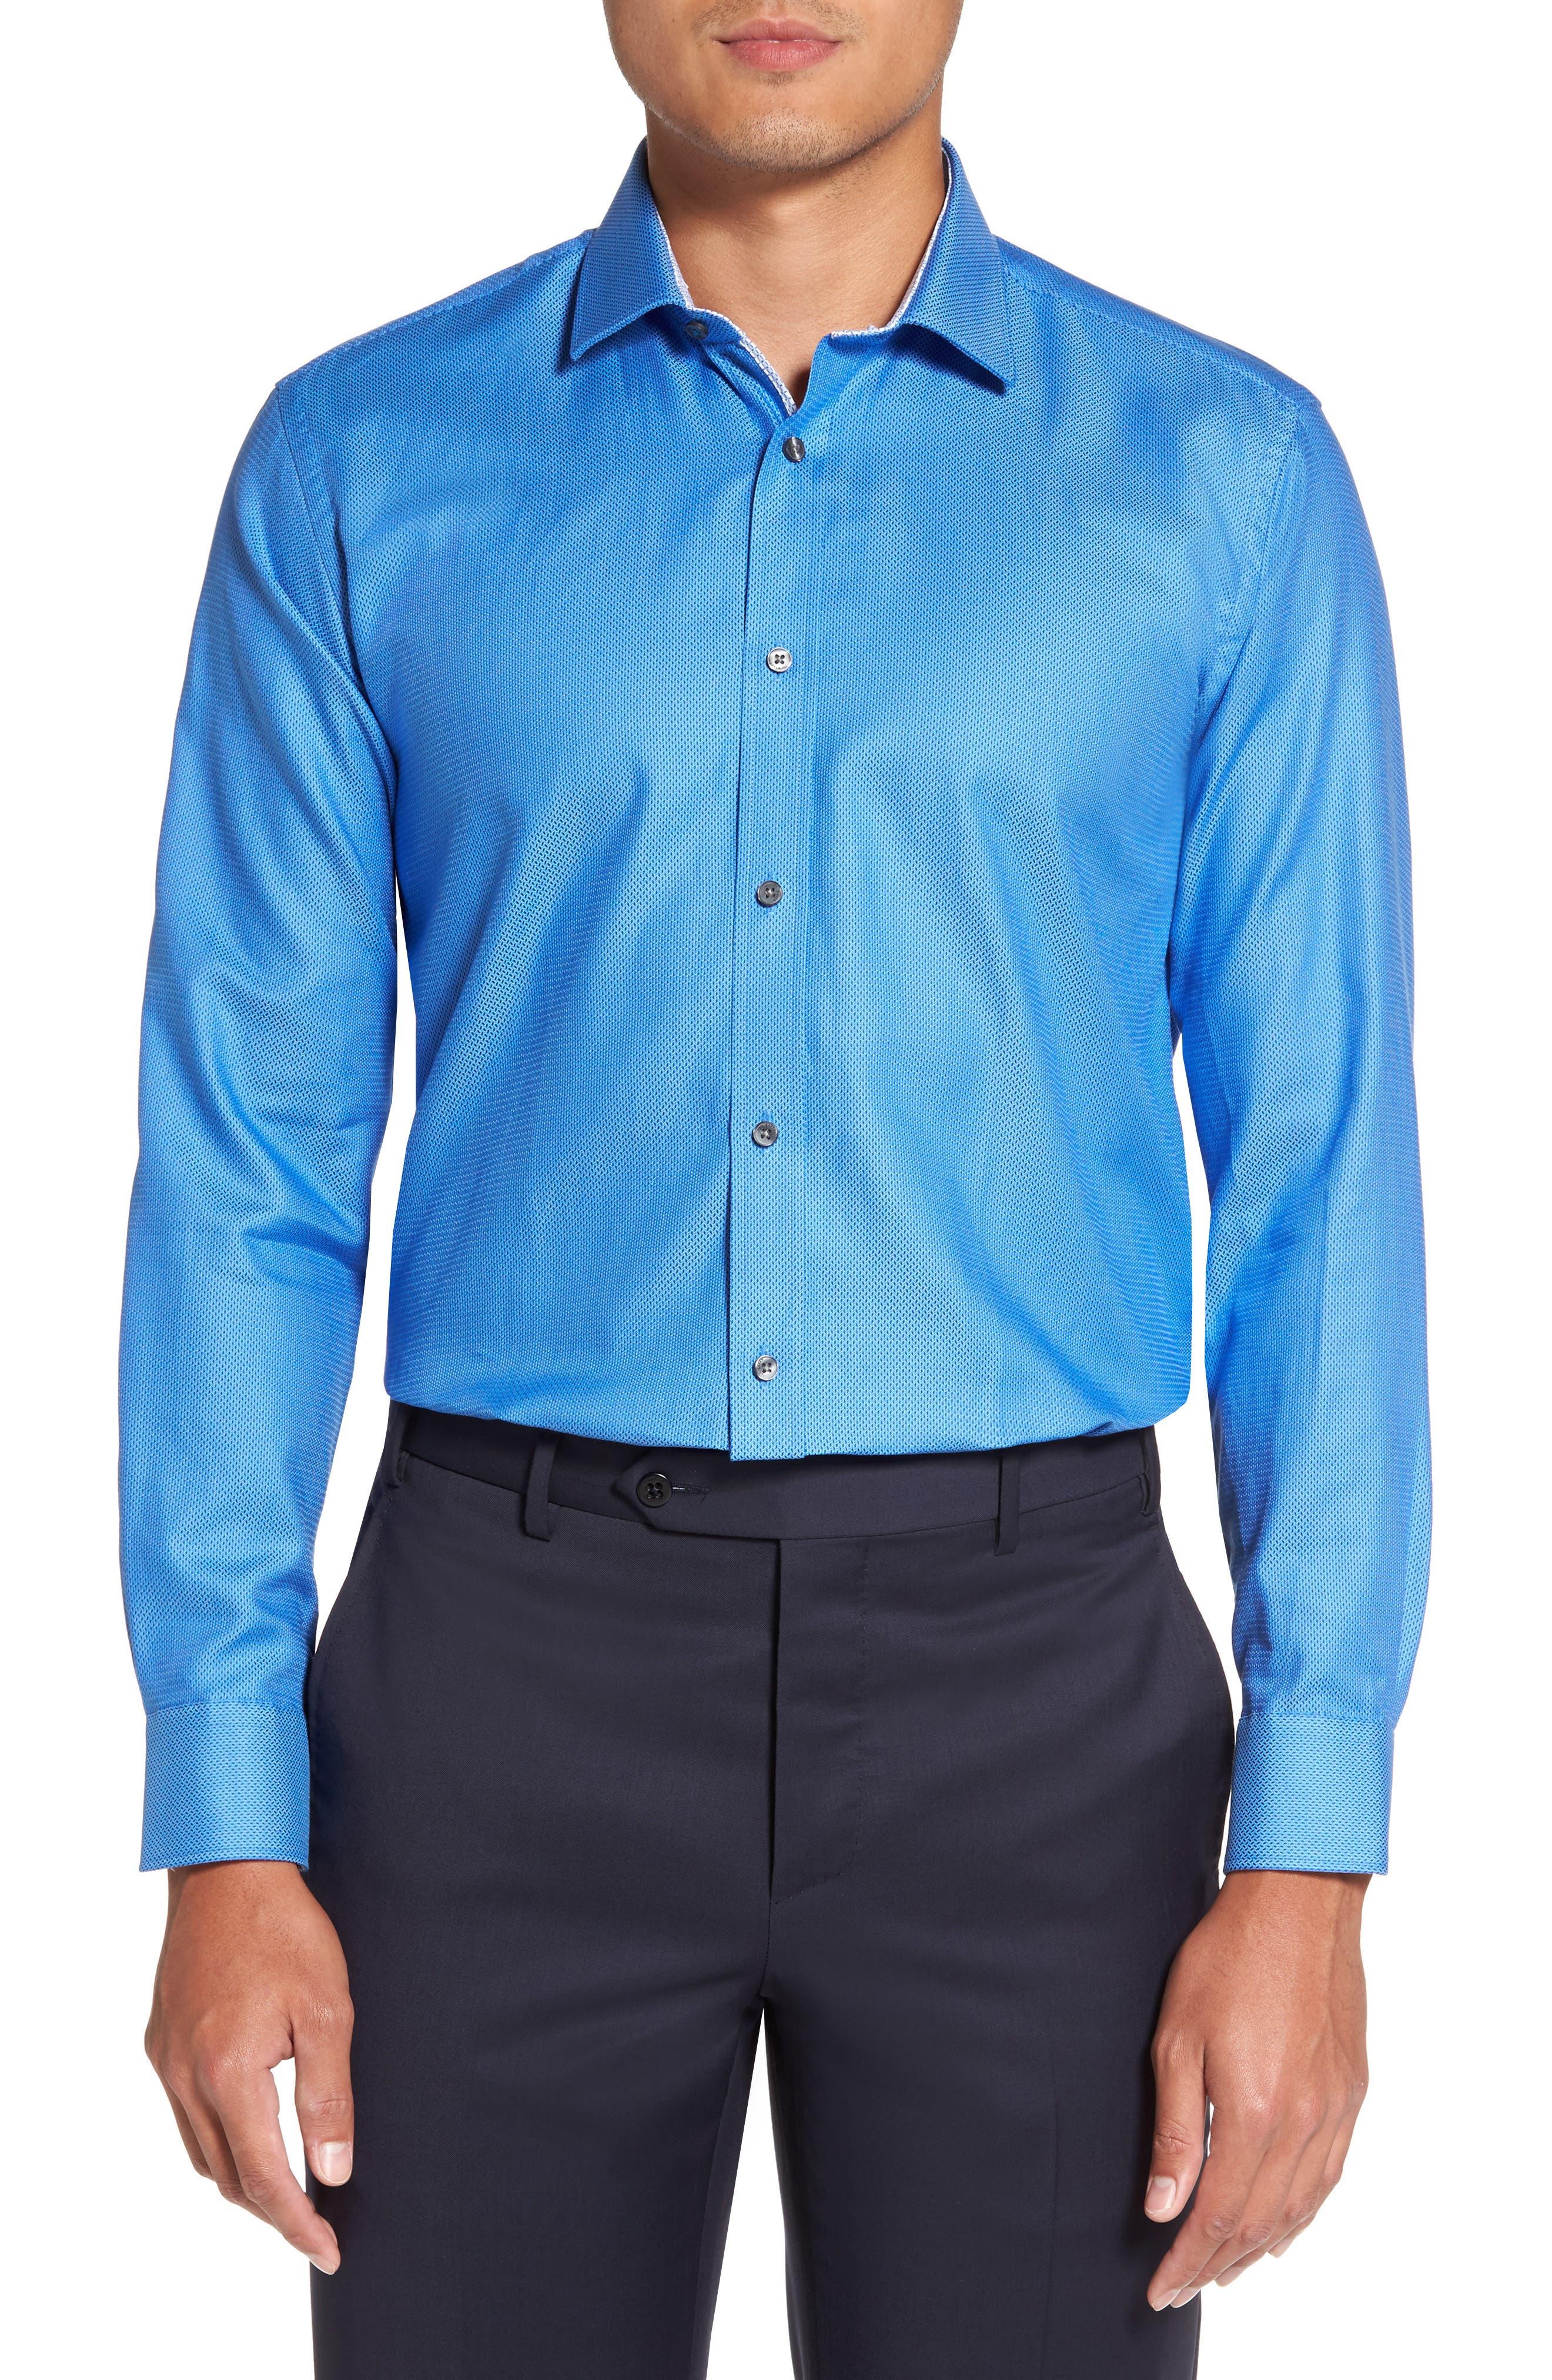 Endurance Trim Fit Geometric Dress Shirt,                         Main,                         color,